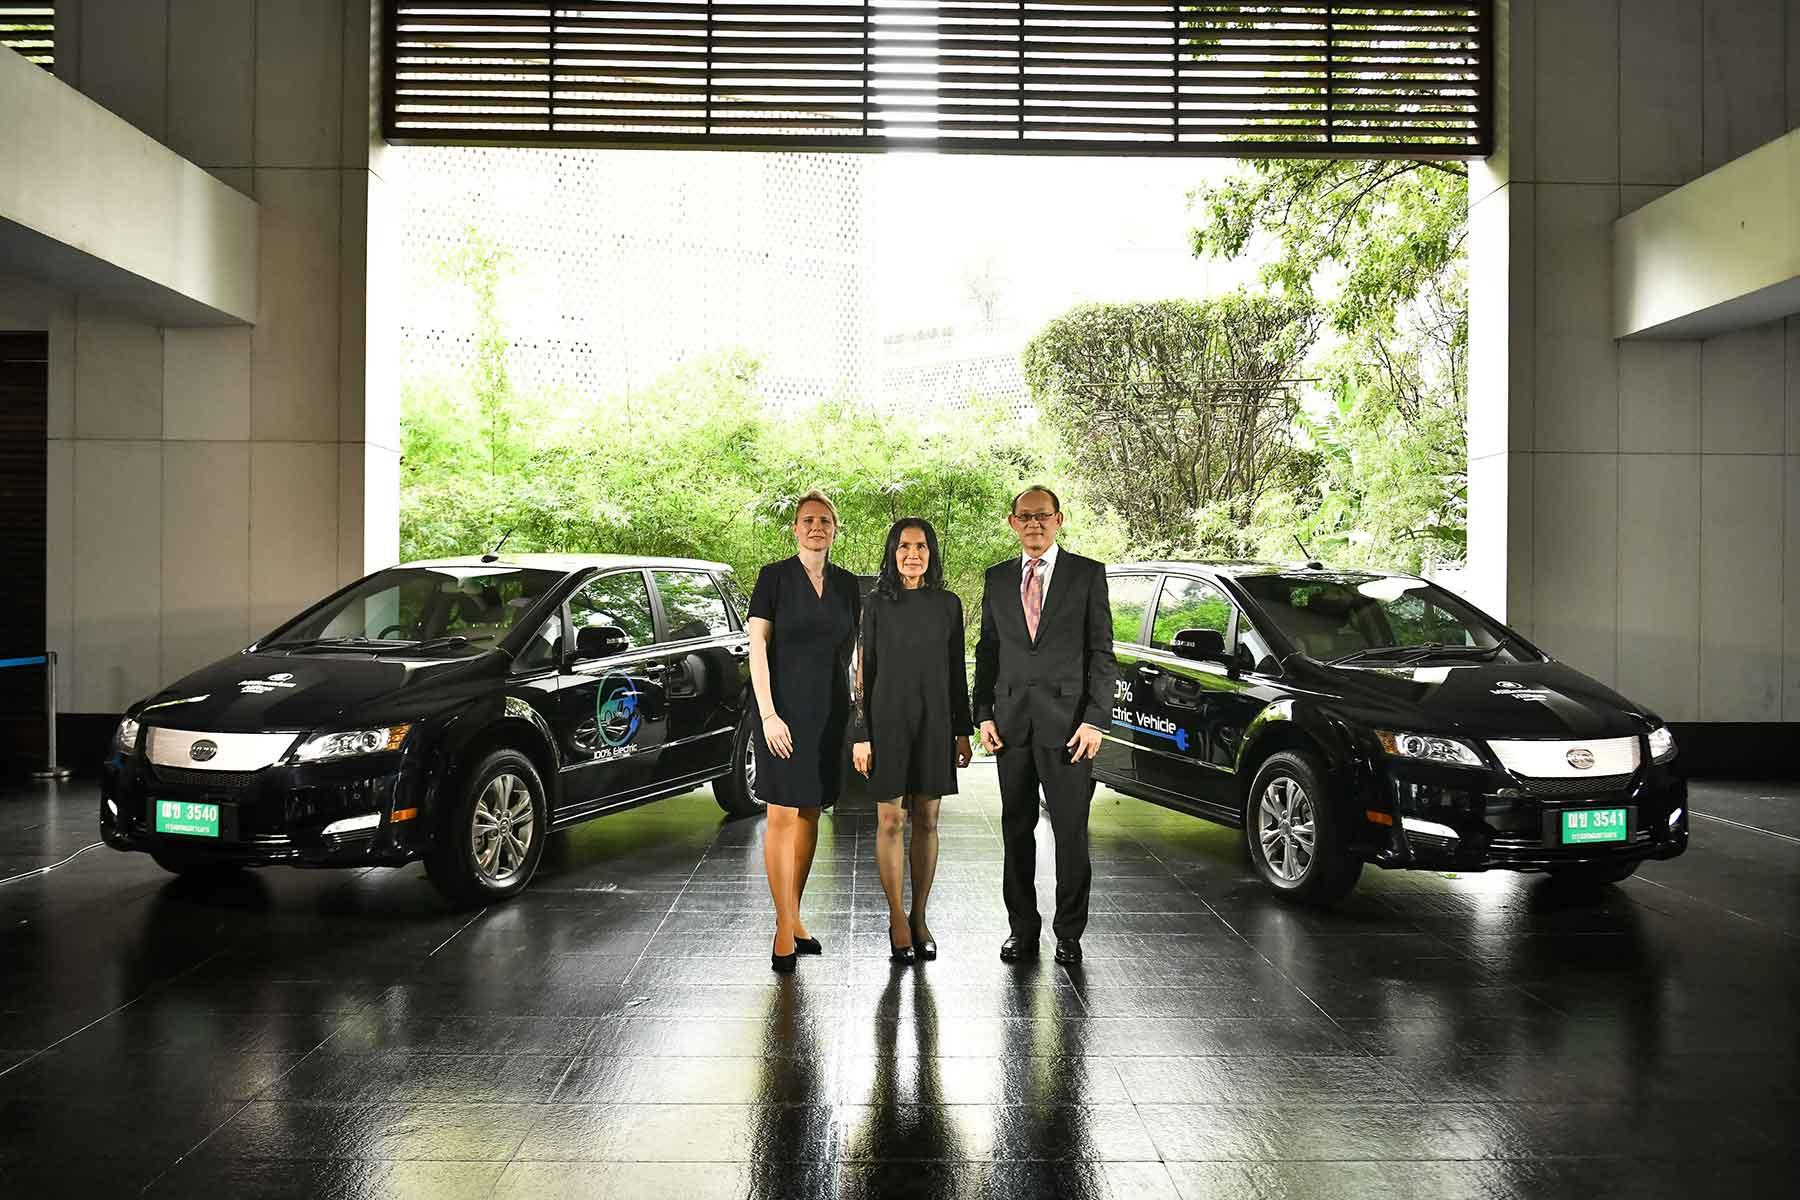 Millennium Hilton Bangkok Electric Limousine Service